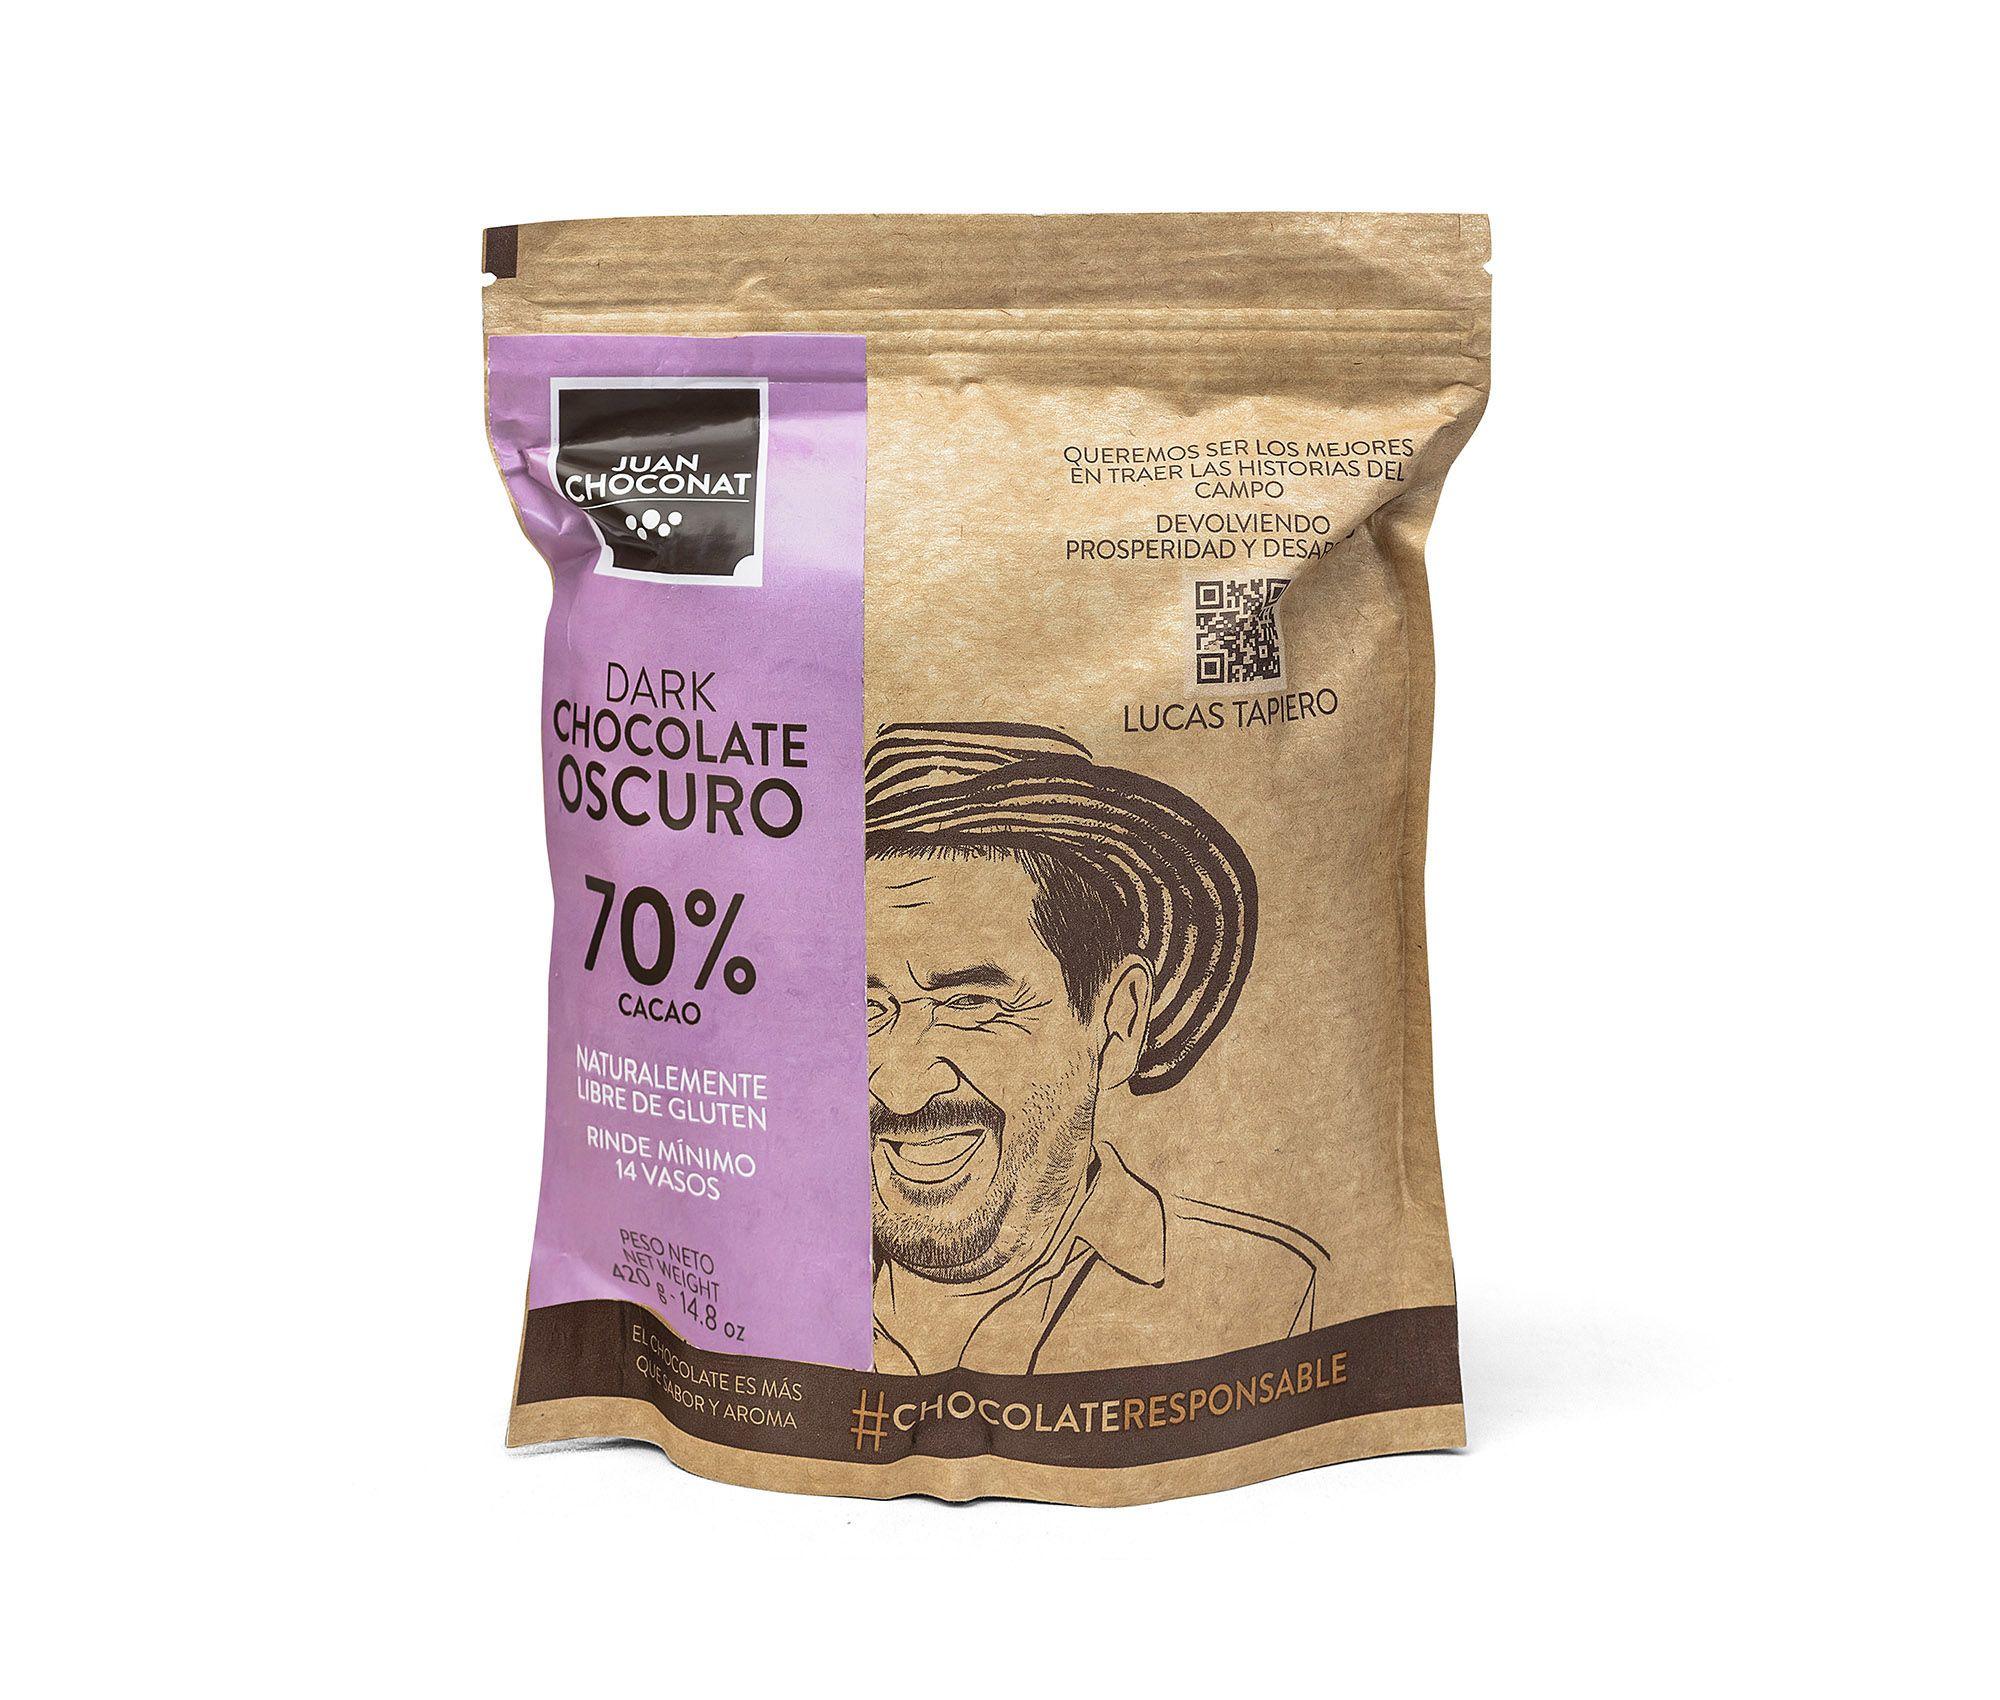 Choconat-70% cacao 420 gramos